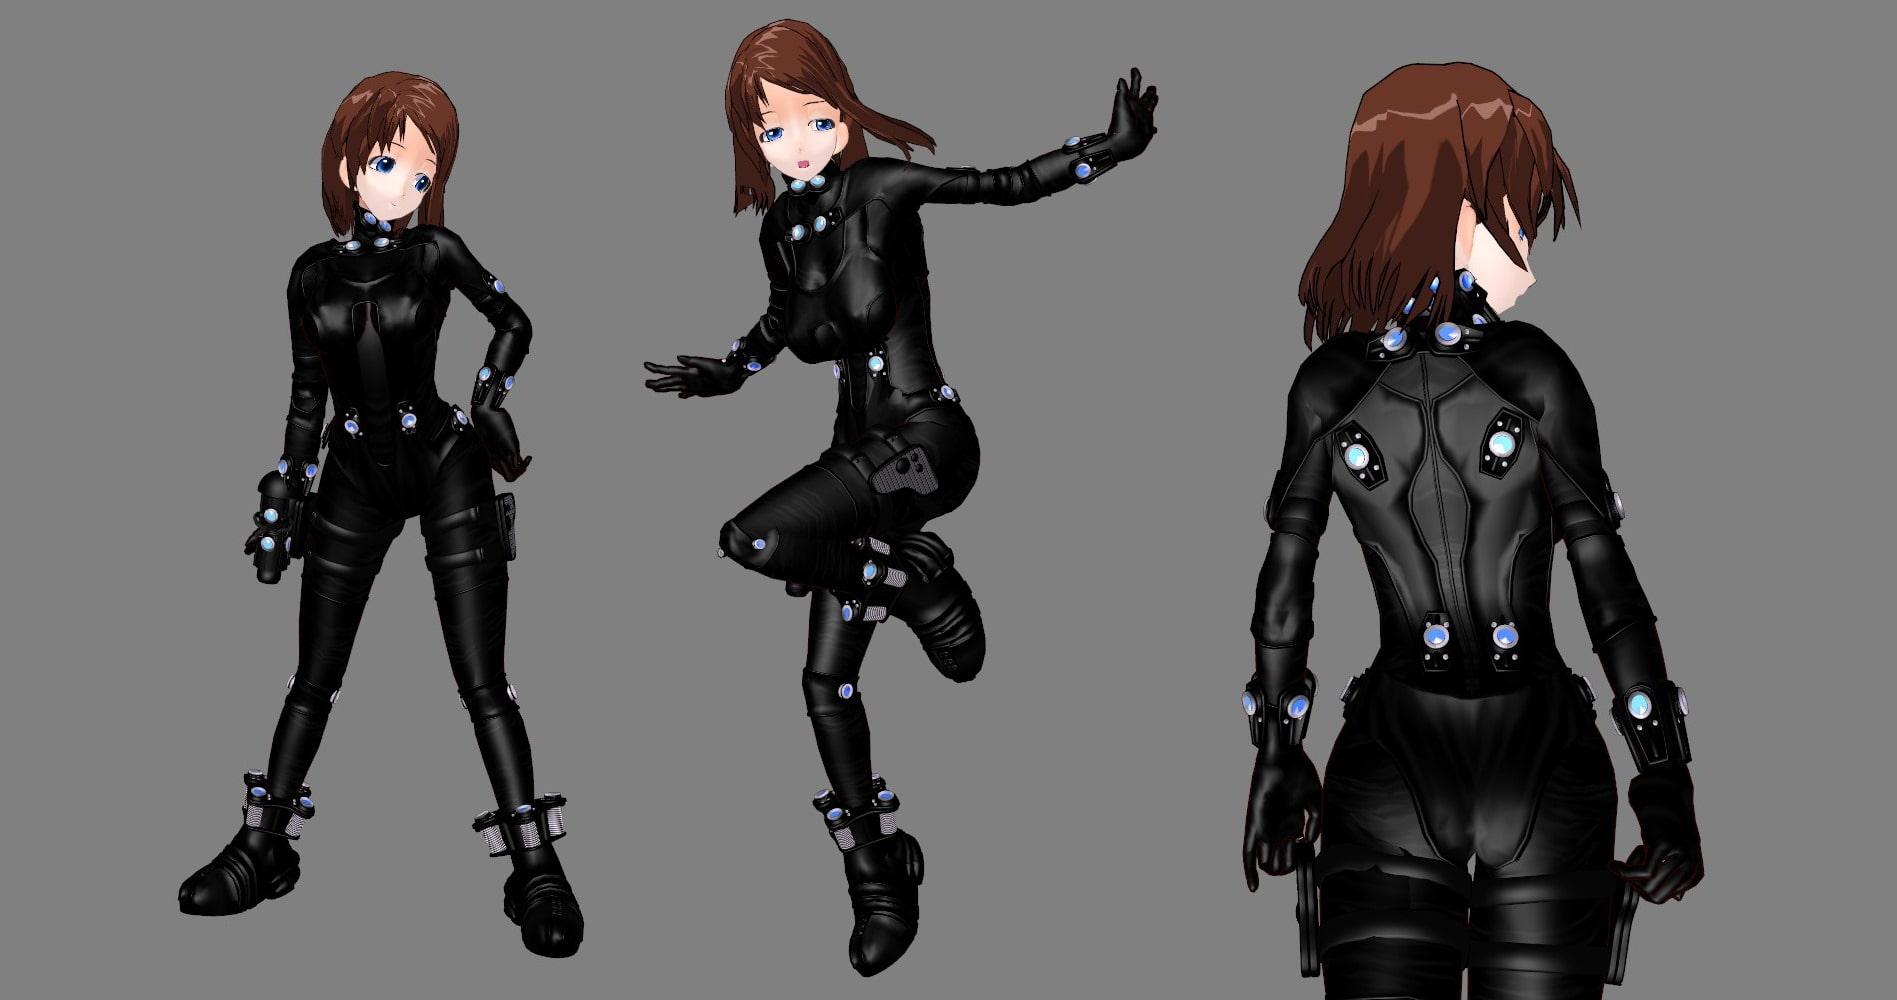 3D Latex Bondage 3d custom outfitters - g*ntz - body suit [metalogic